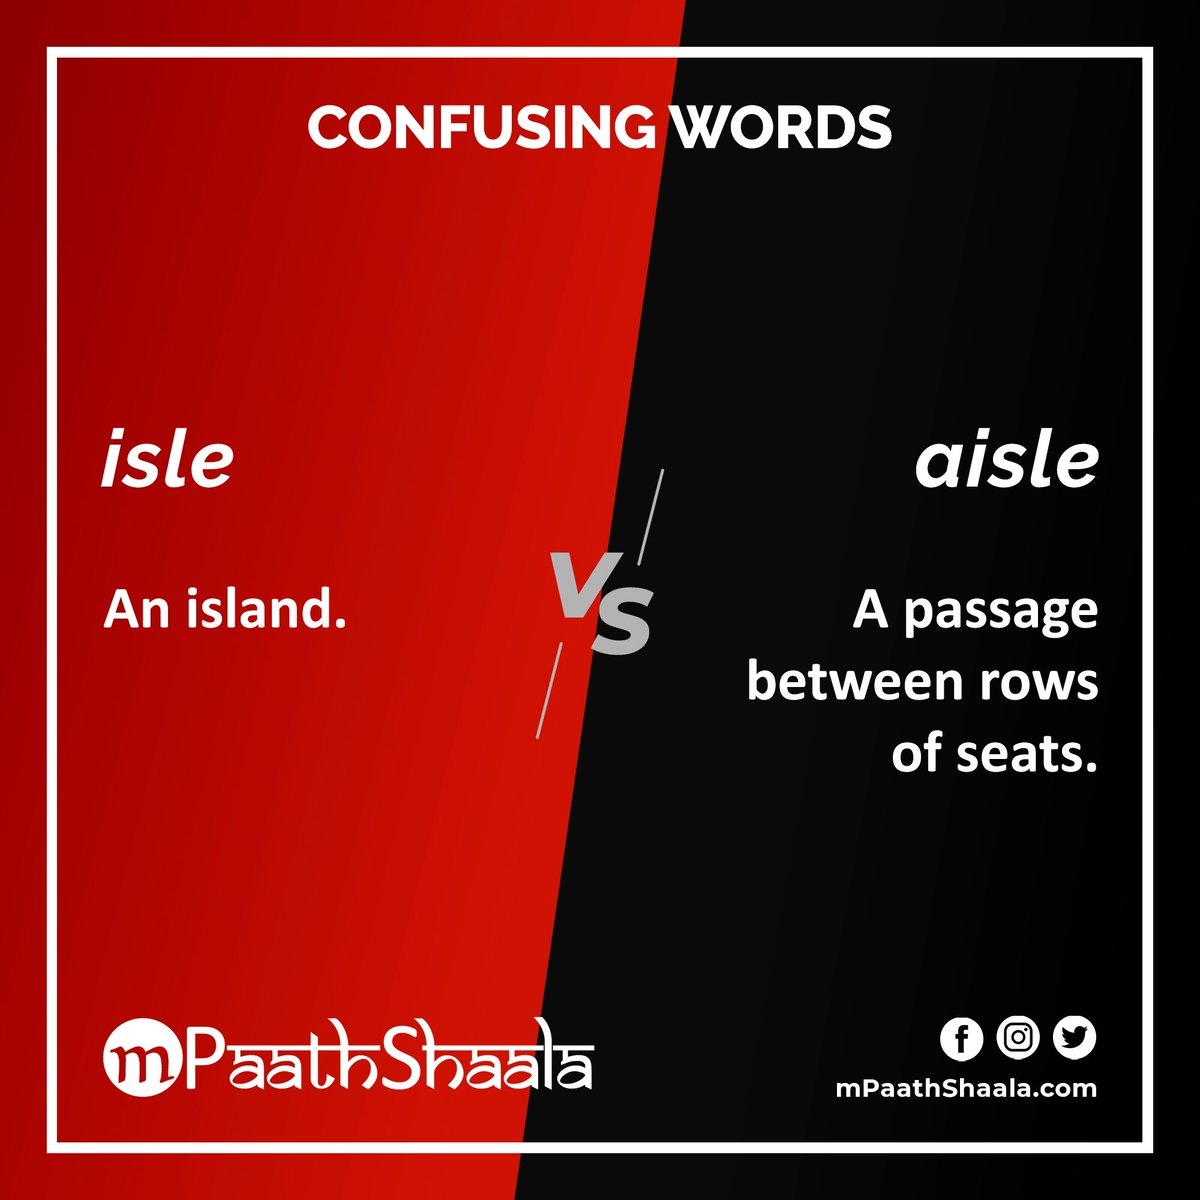 #ConfusingWords isle versus aisle   . #Vocabulary #English #EnglishVocabulary #IELTS  #TOEFL #Words #Spelling #Learning #Education #WordNerd #Homophones #Homonyms https://t.co/BXn47Ko6Q4